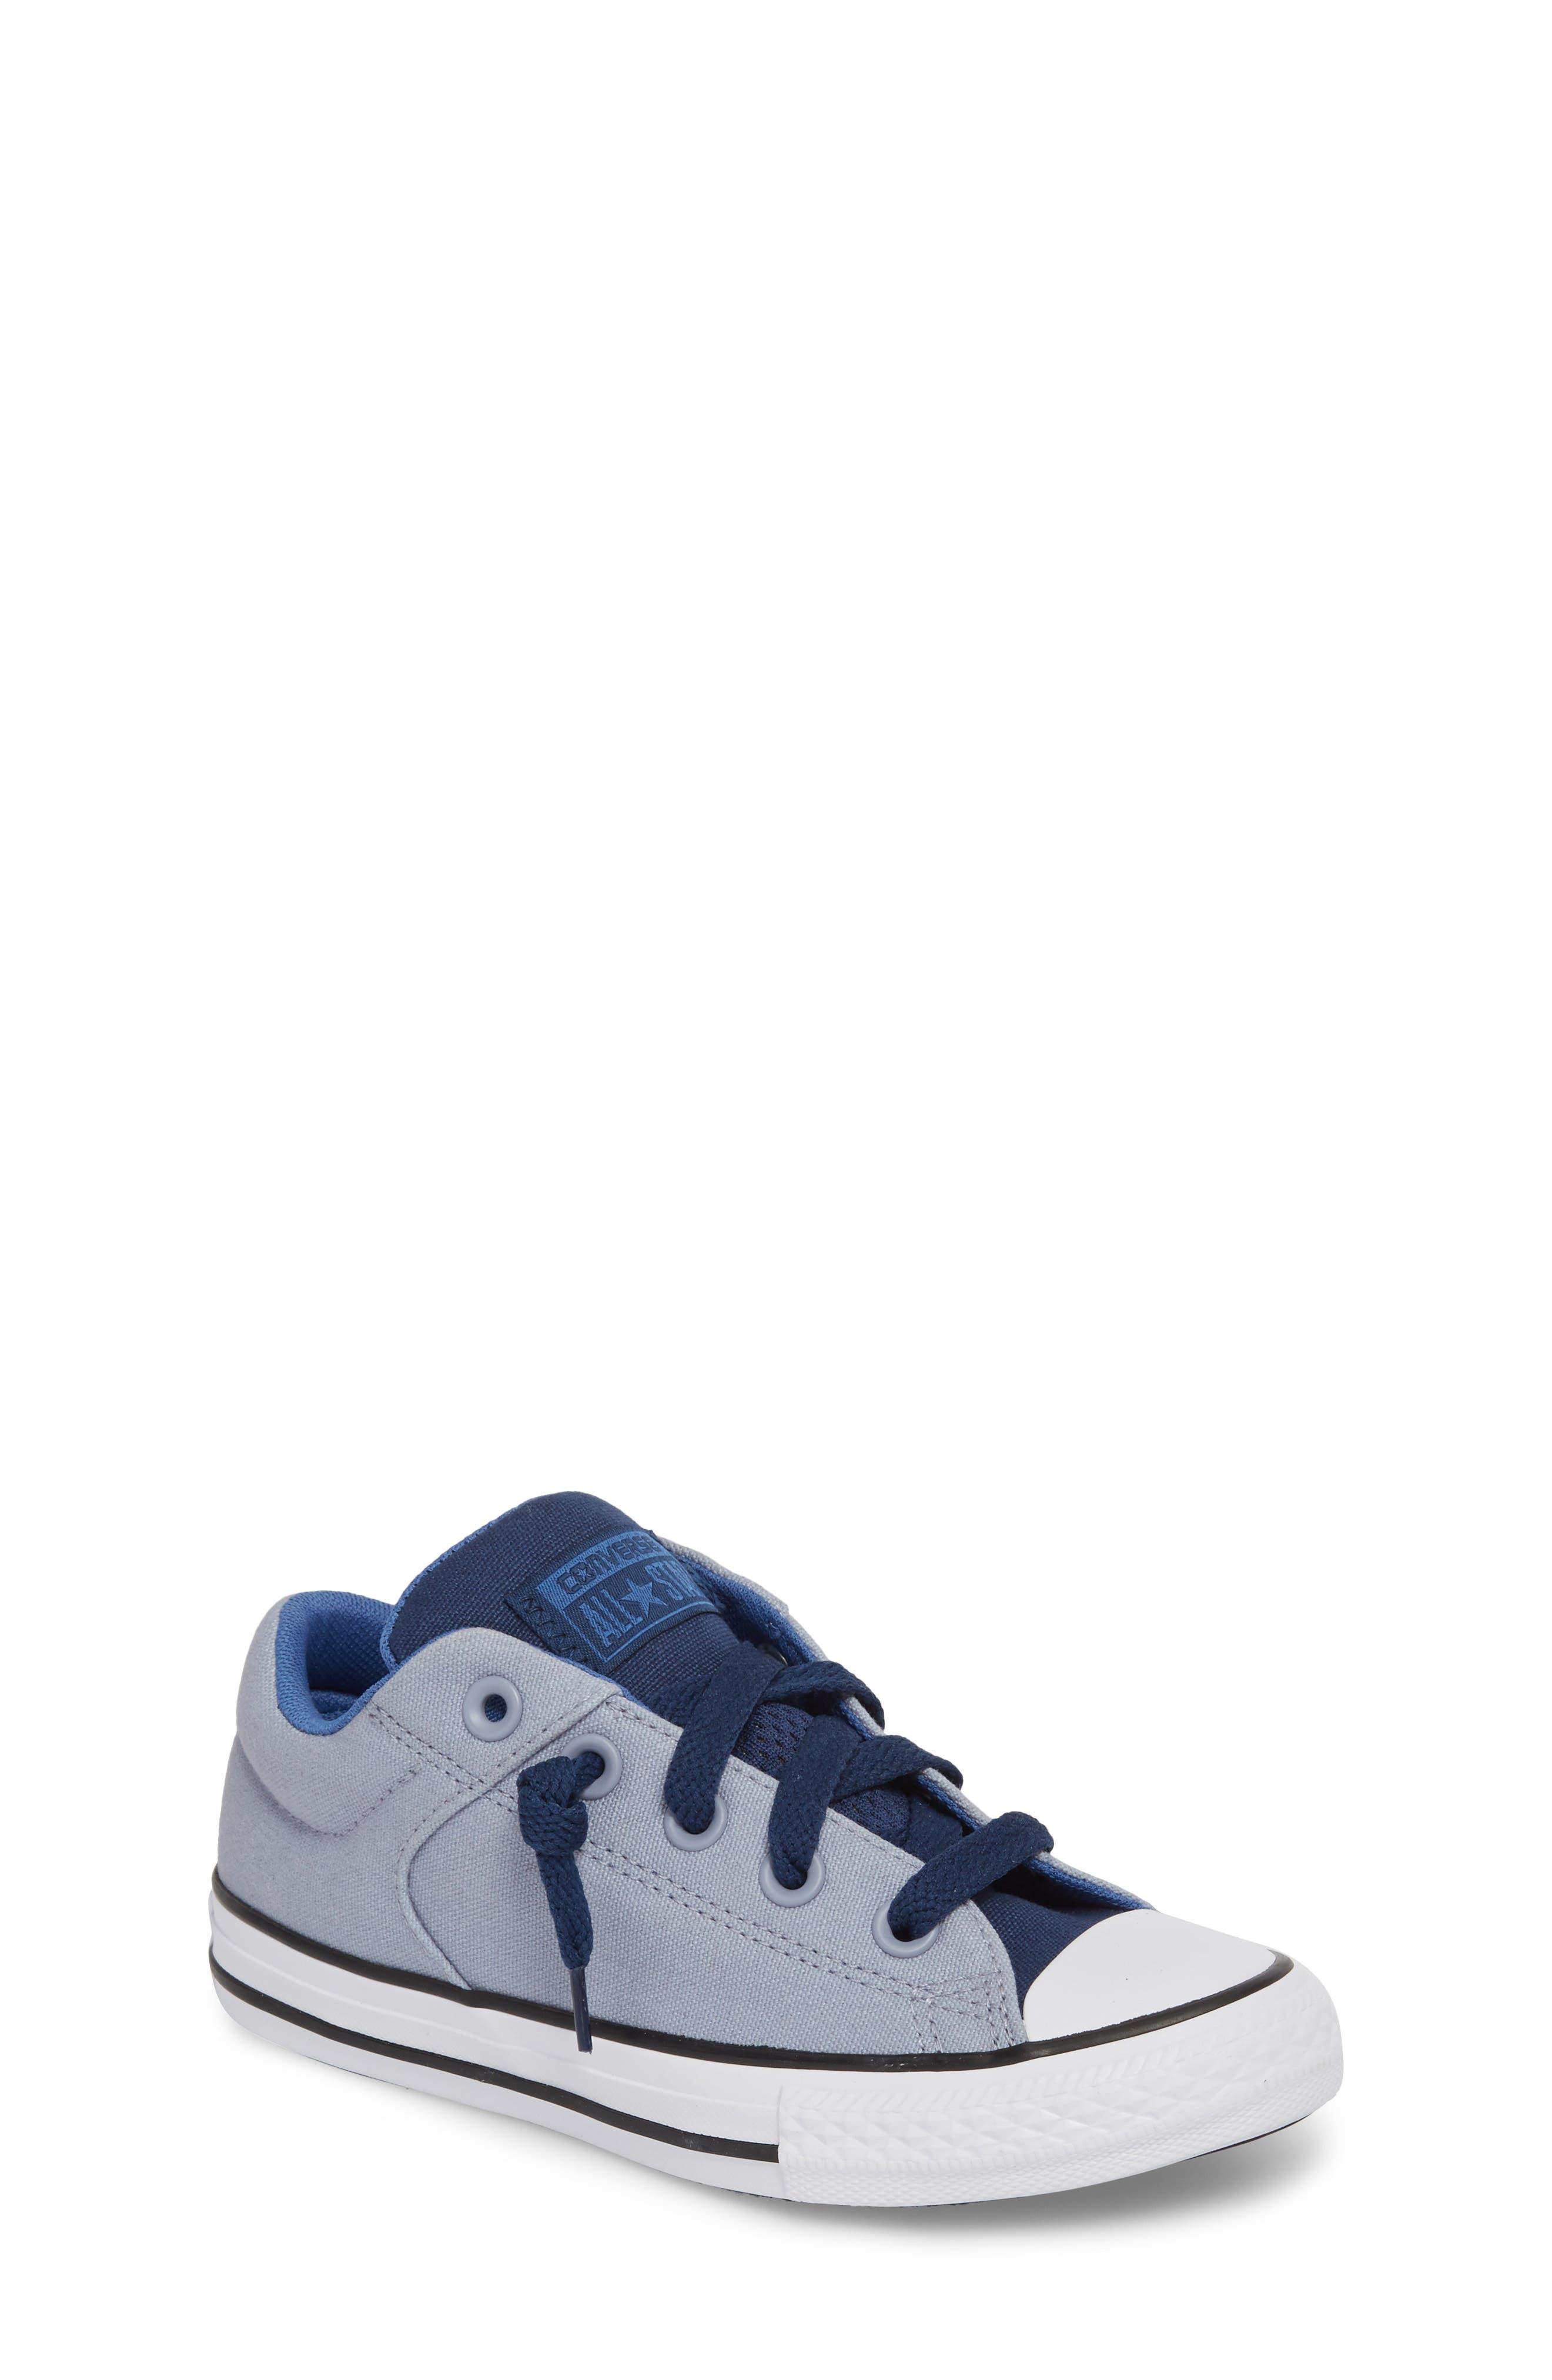 Converse Chuck Taylor® All Star® 'High Street' Slip-On Sneaker (Walker, Toddler, Little Kid & Big Kid)